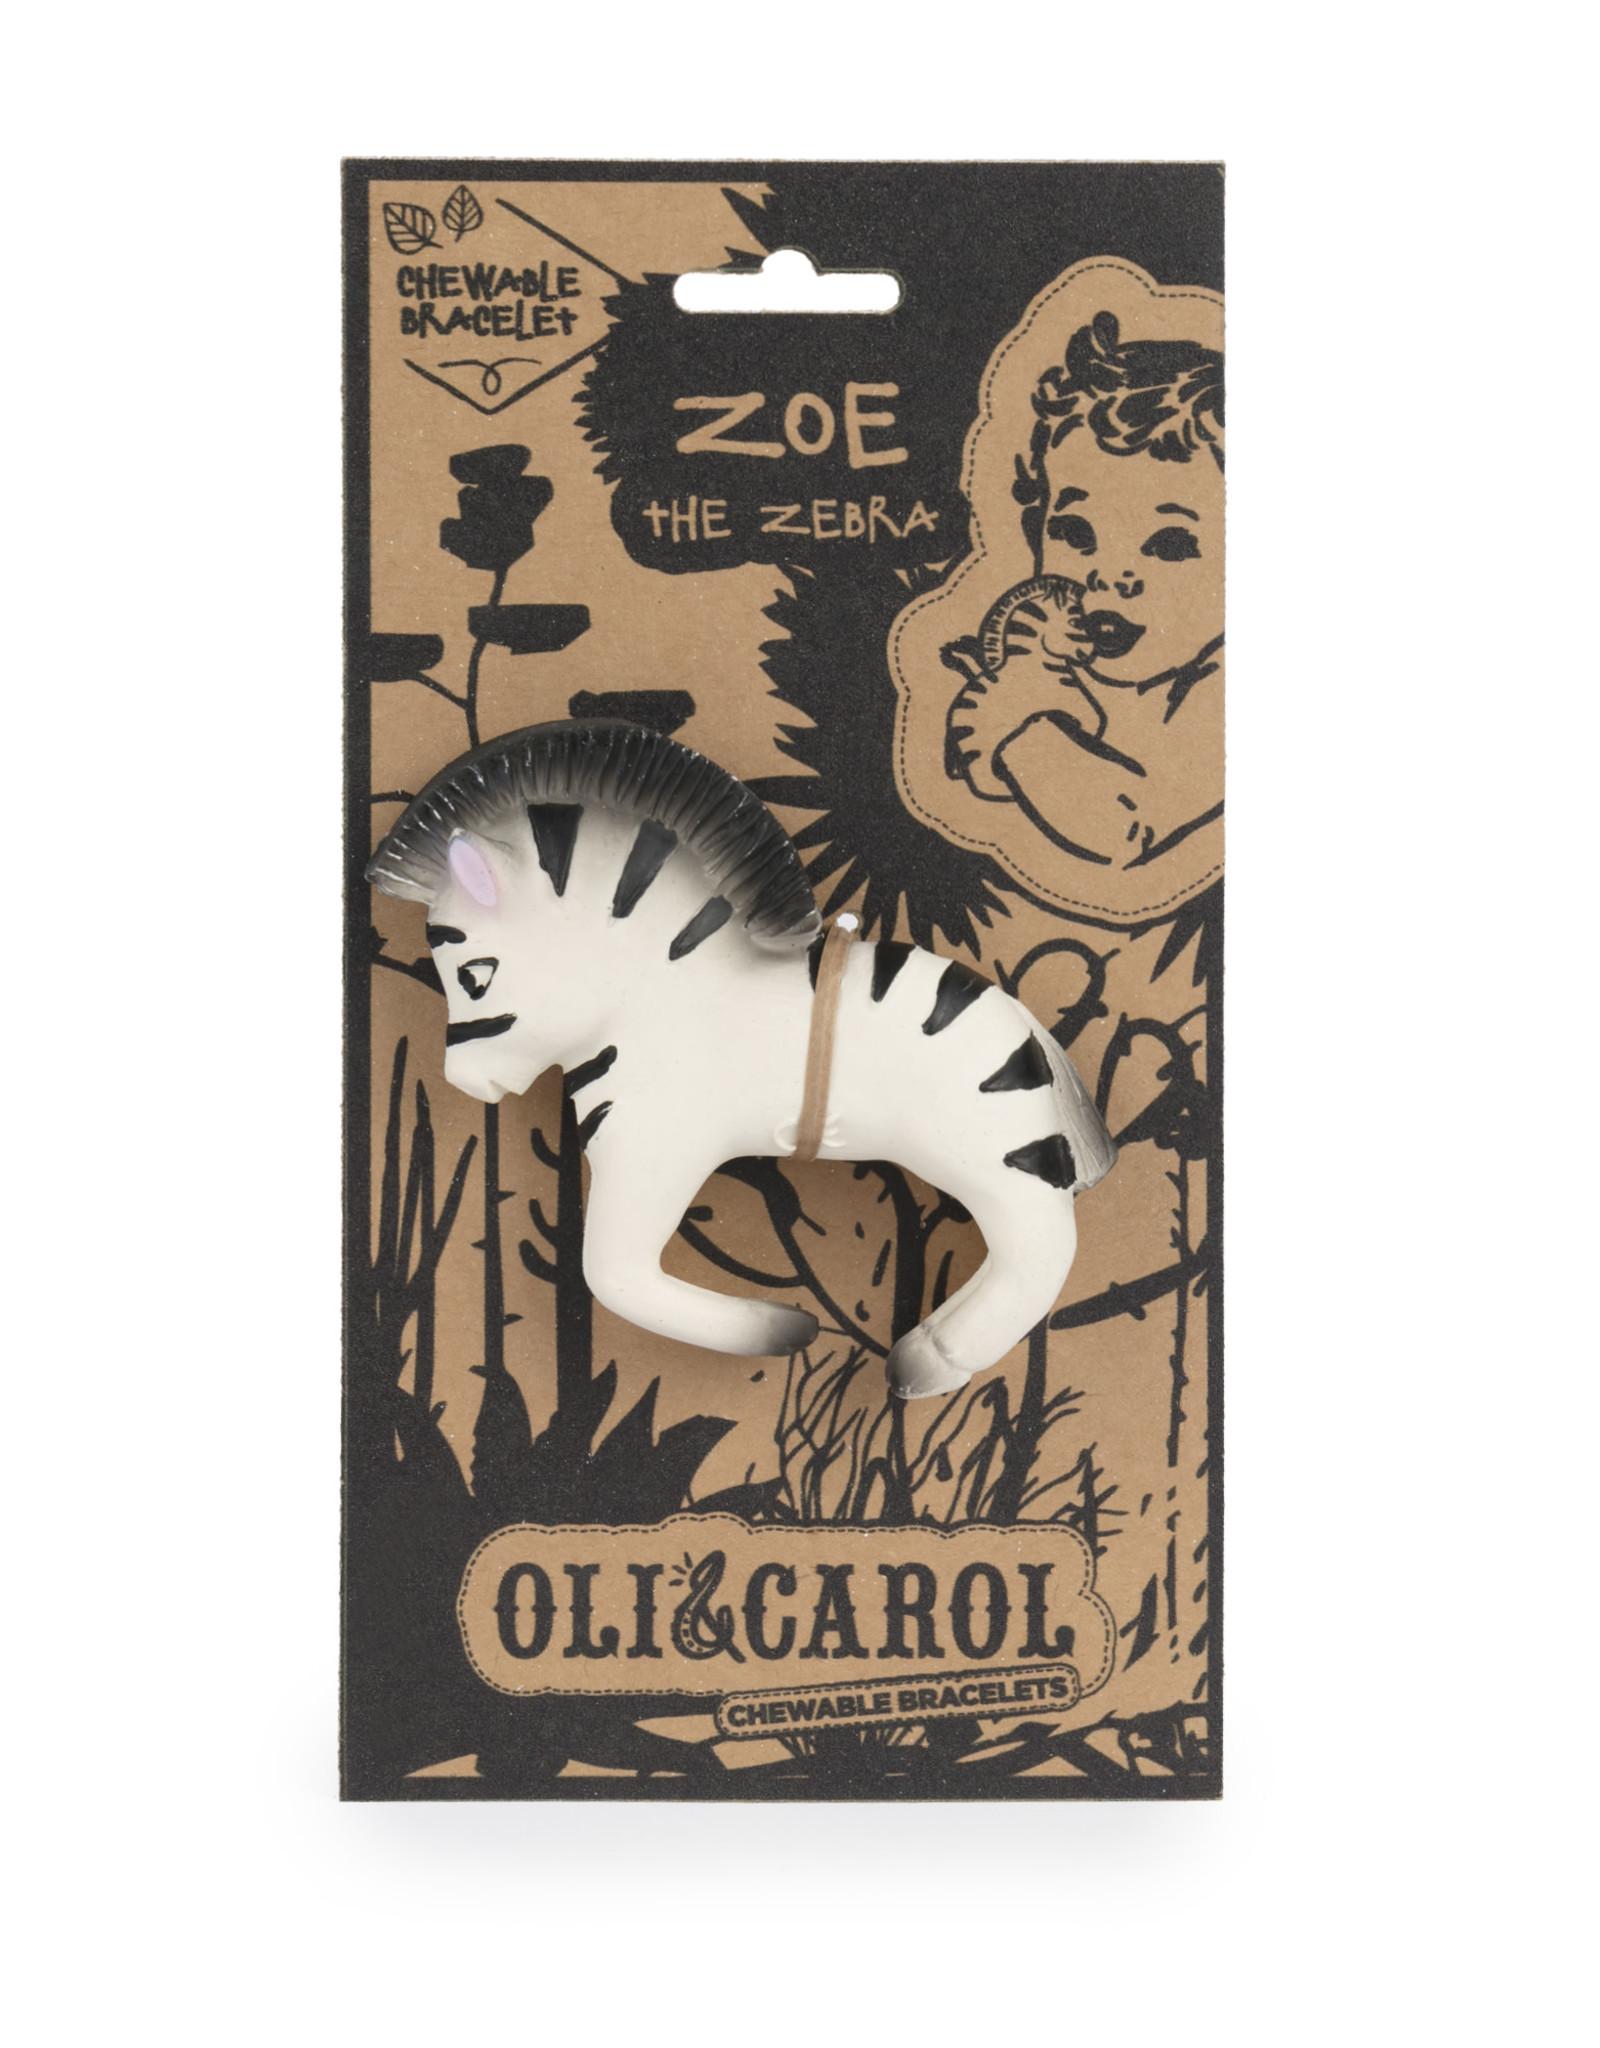 Oli & Carol Chewable Bracelet - Zoe the Zebra